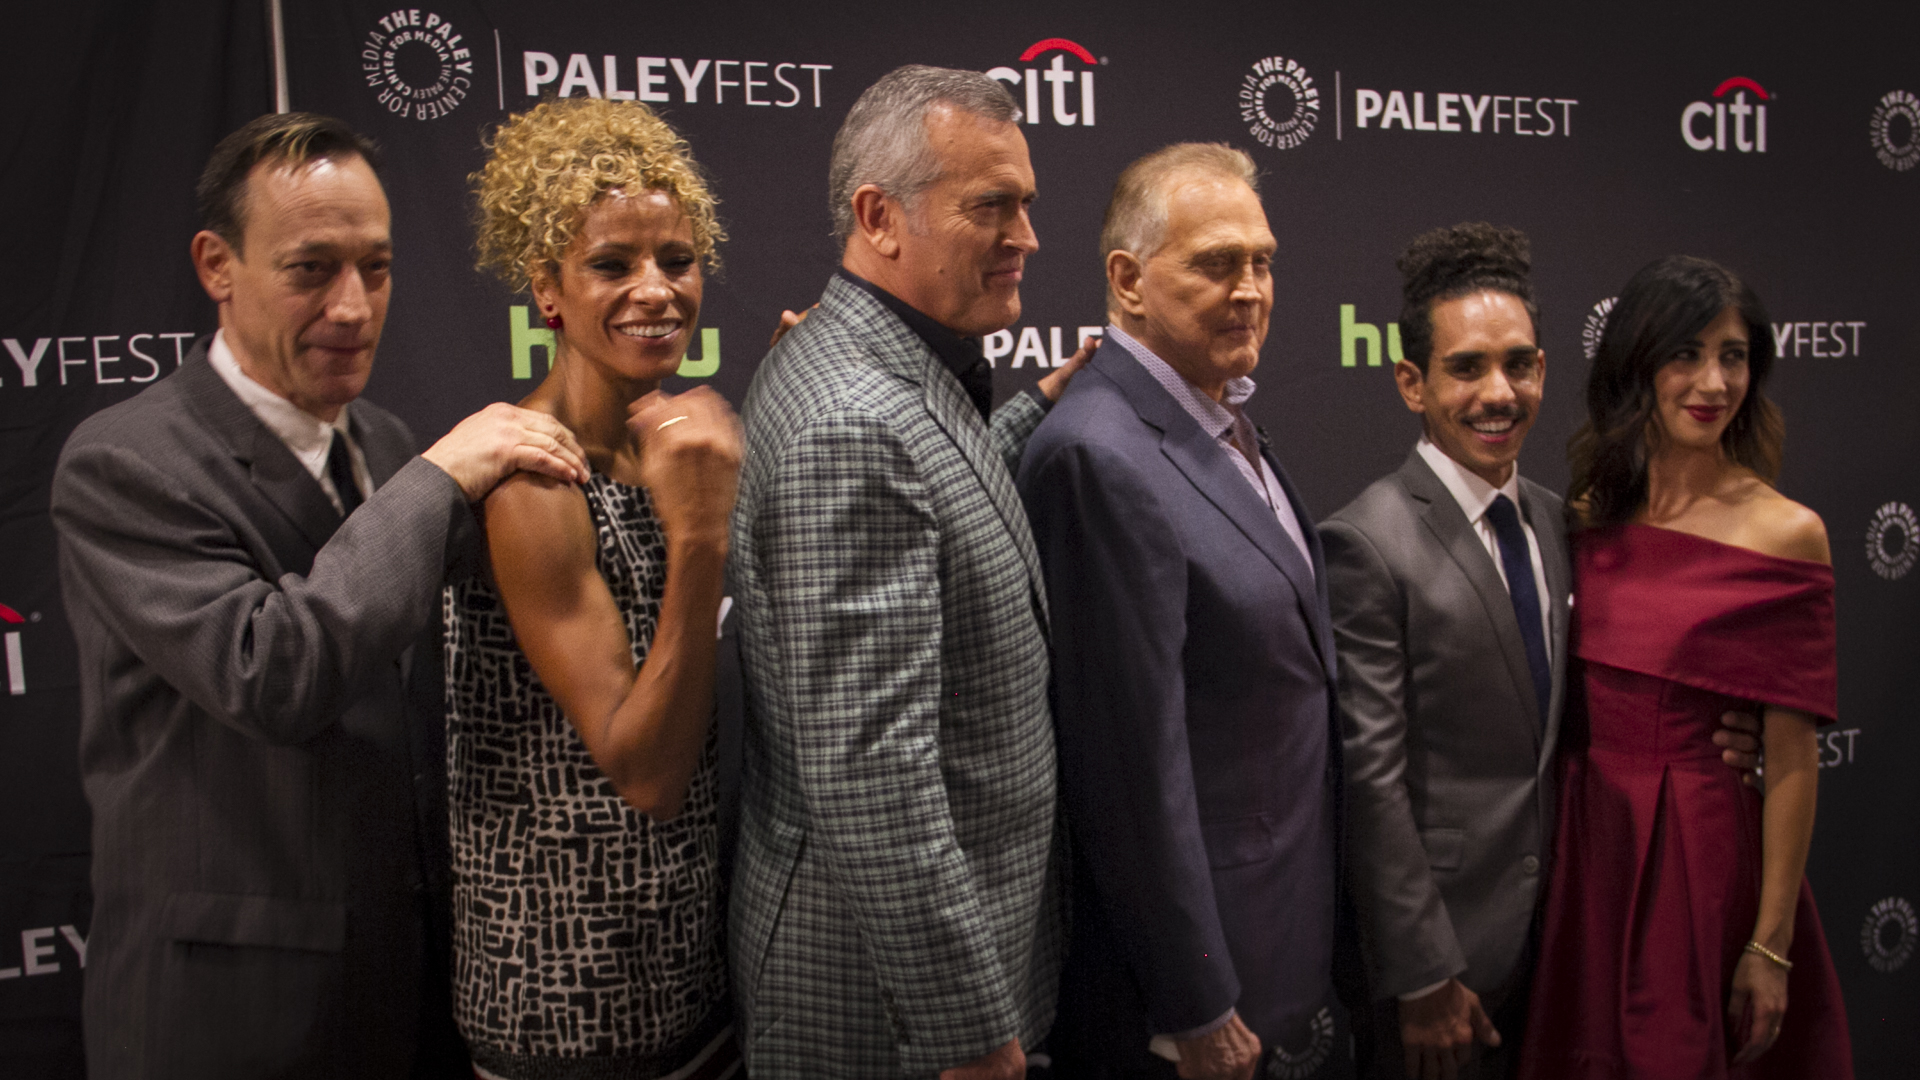 Ted Raimi, Michelle Hurd, Bruce Campbell, Lee Majors, Ray Santiago, Dana DeLorenzo